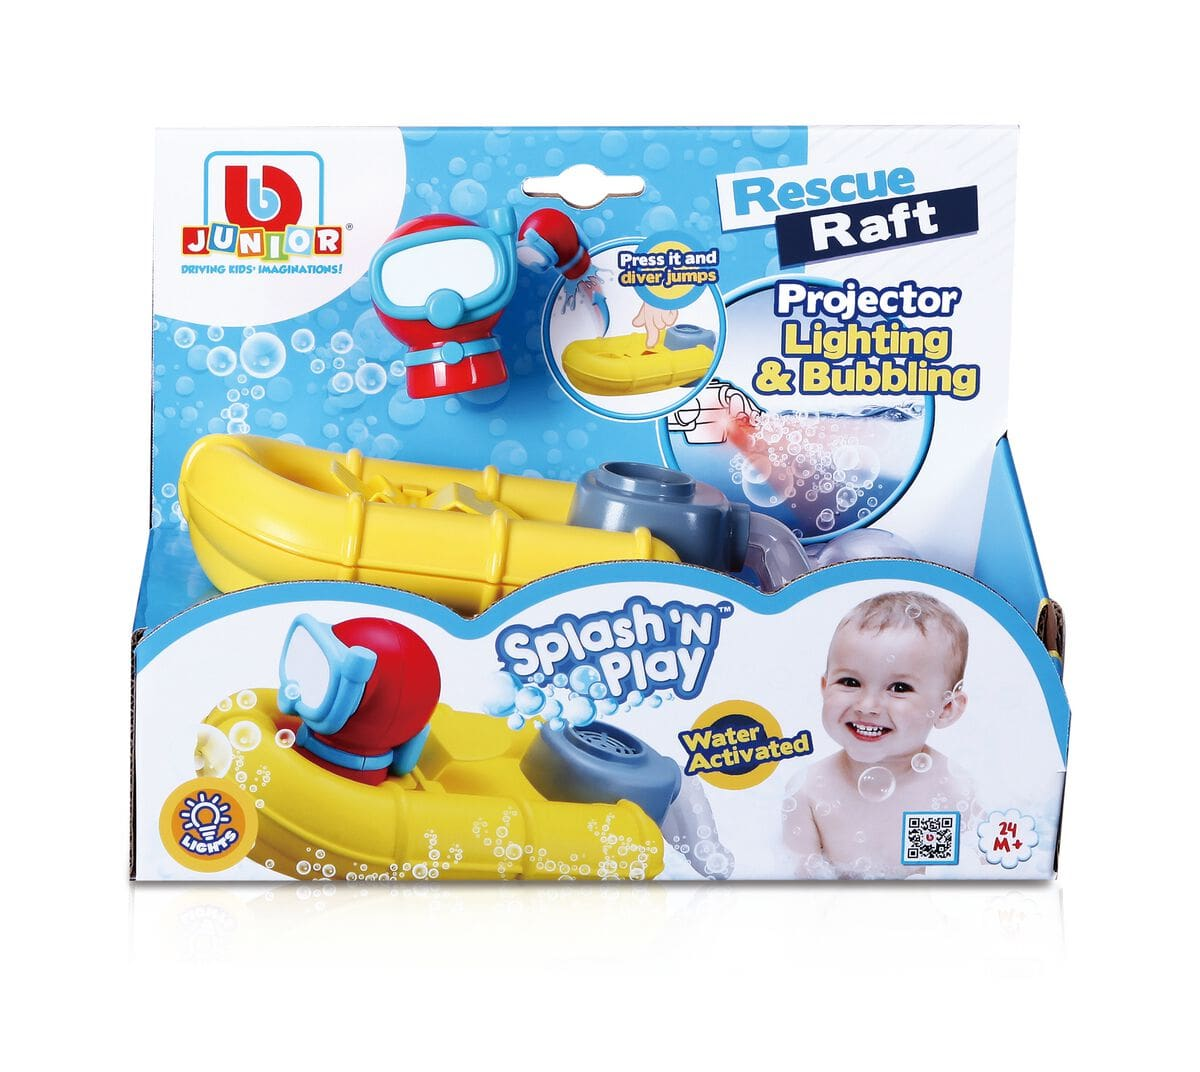 Burago Splash'n Play Rescue Craft Boat Giocattoli acquatici